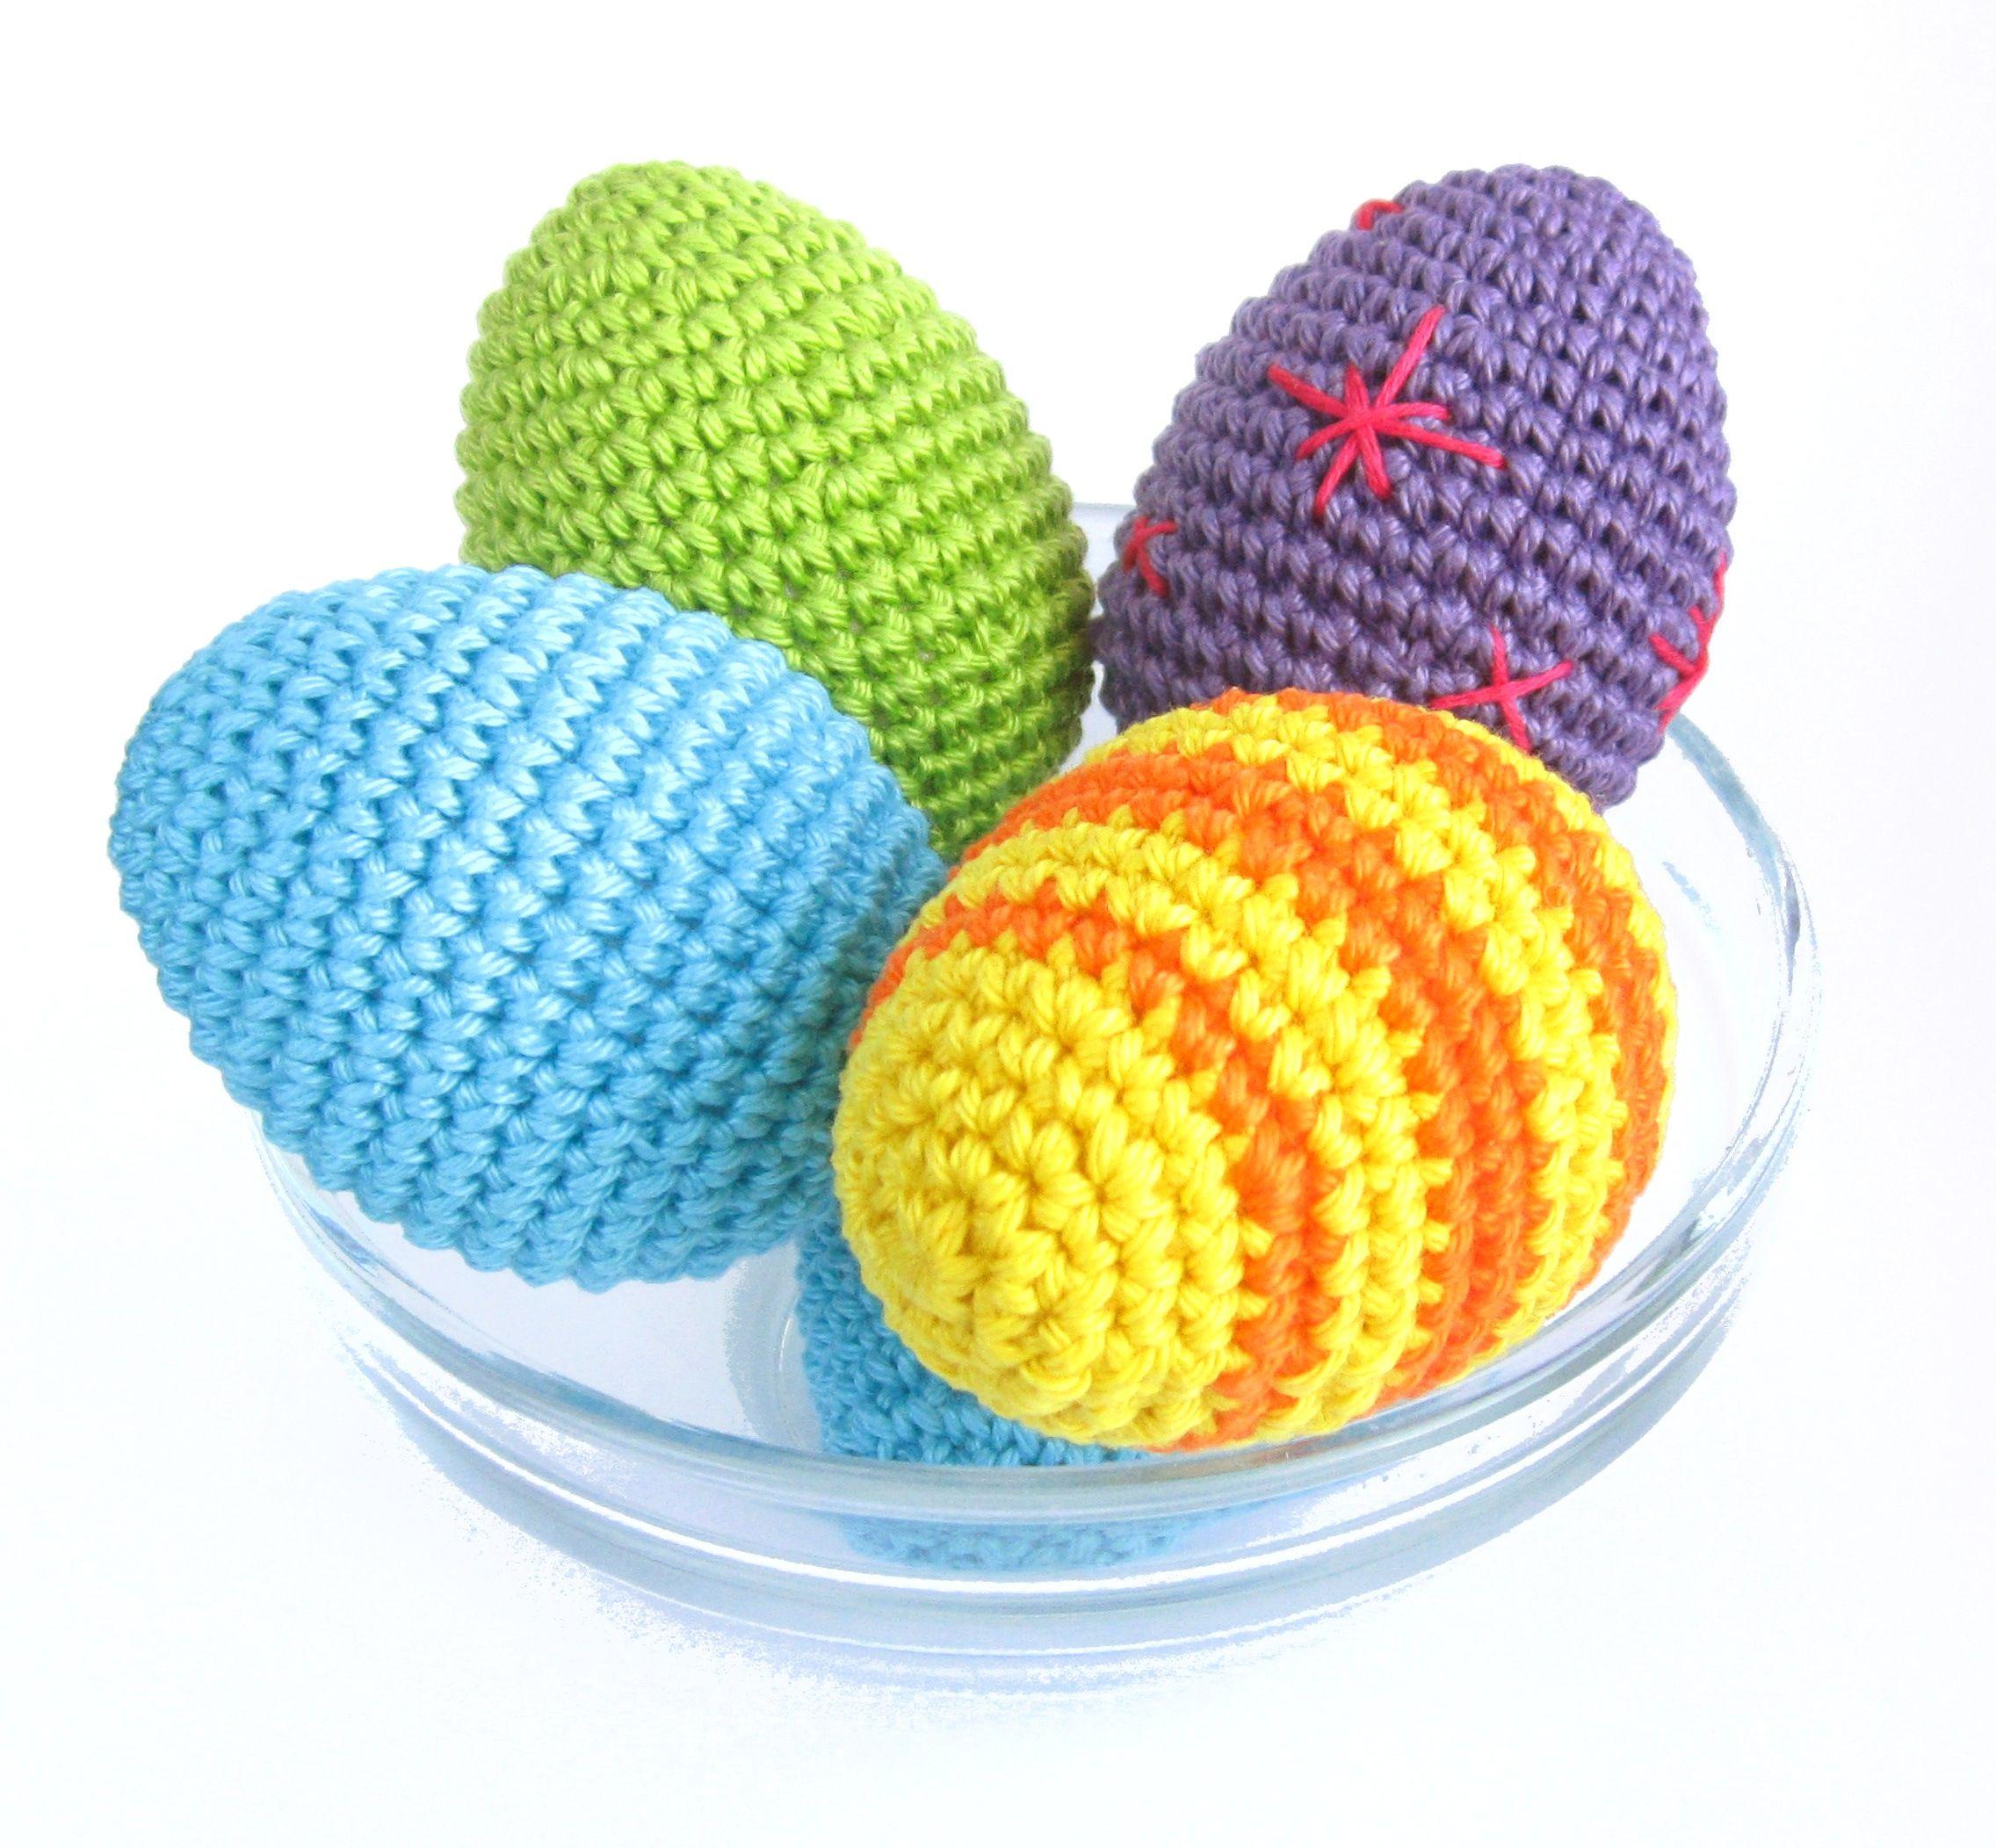 Free pattern easter eggs kristi tullus sidrunspire free pattern easter eggs kristi tullus sidrunspire dt1010fo